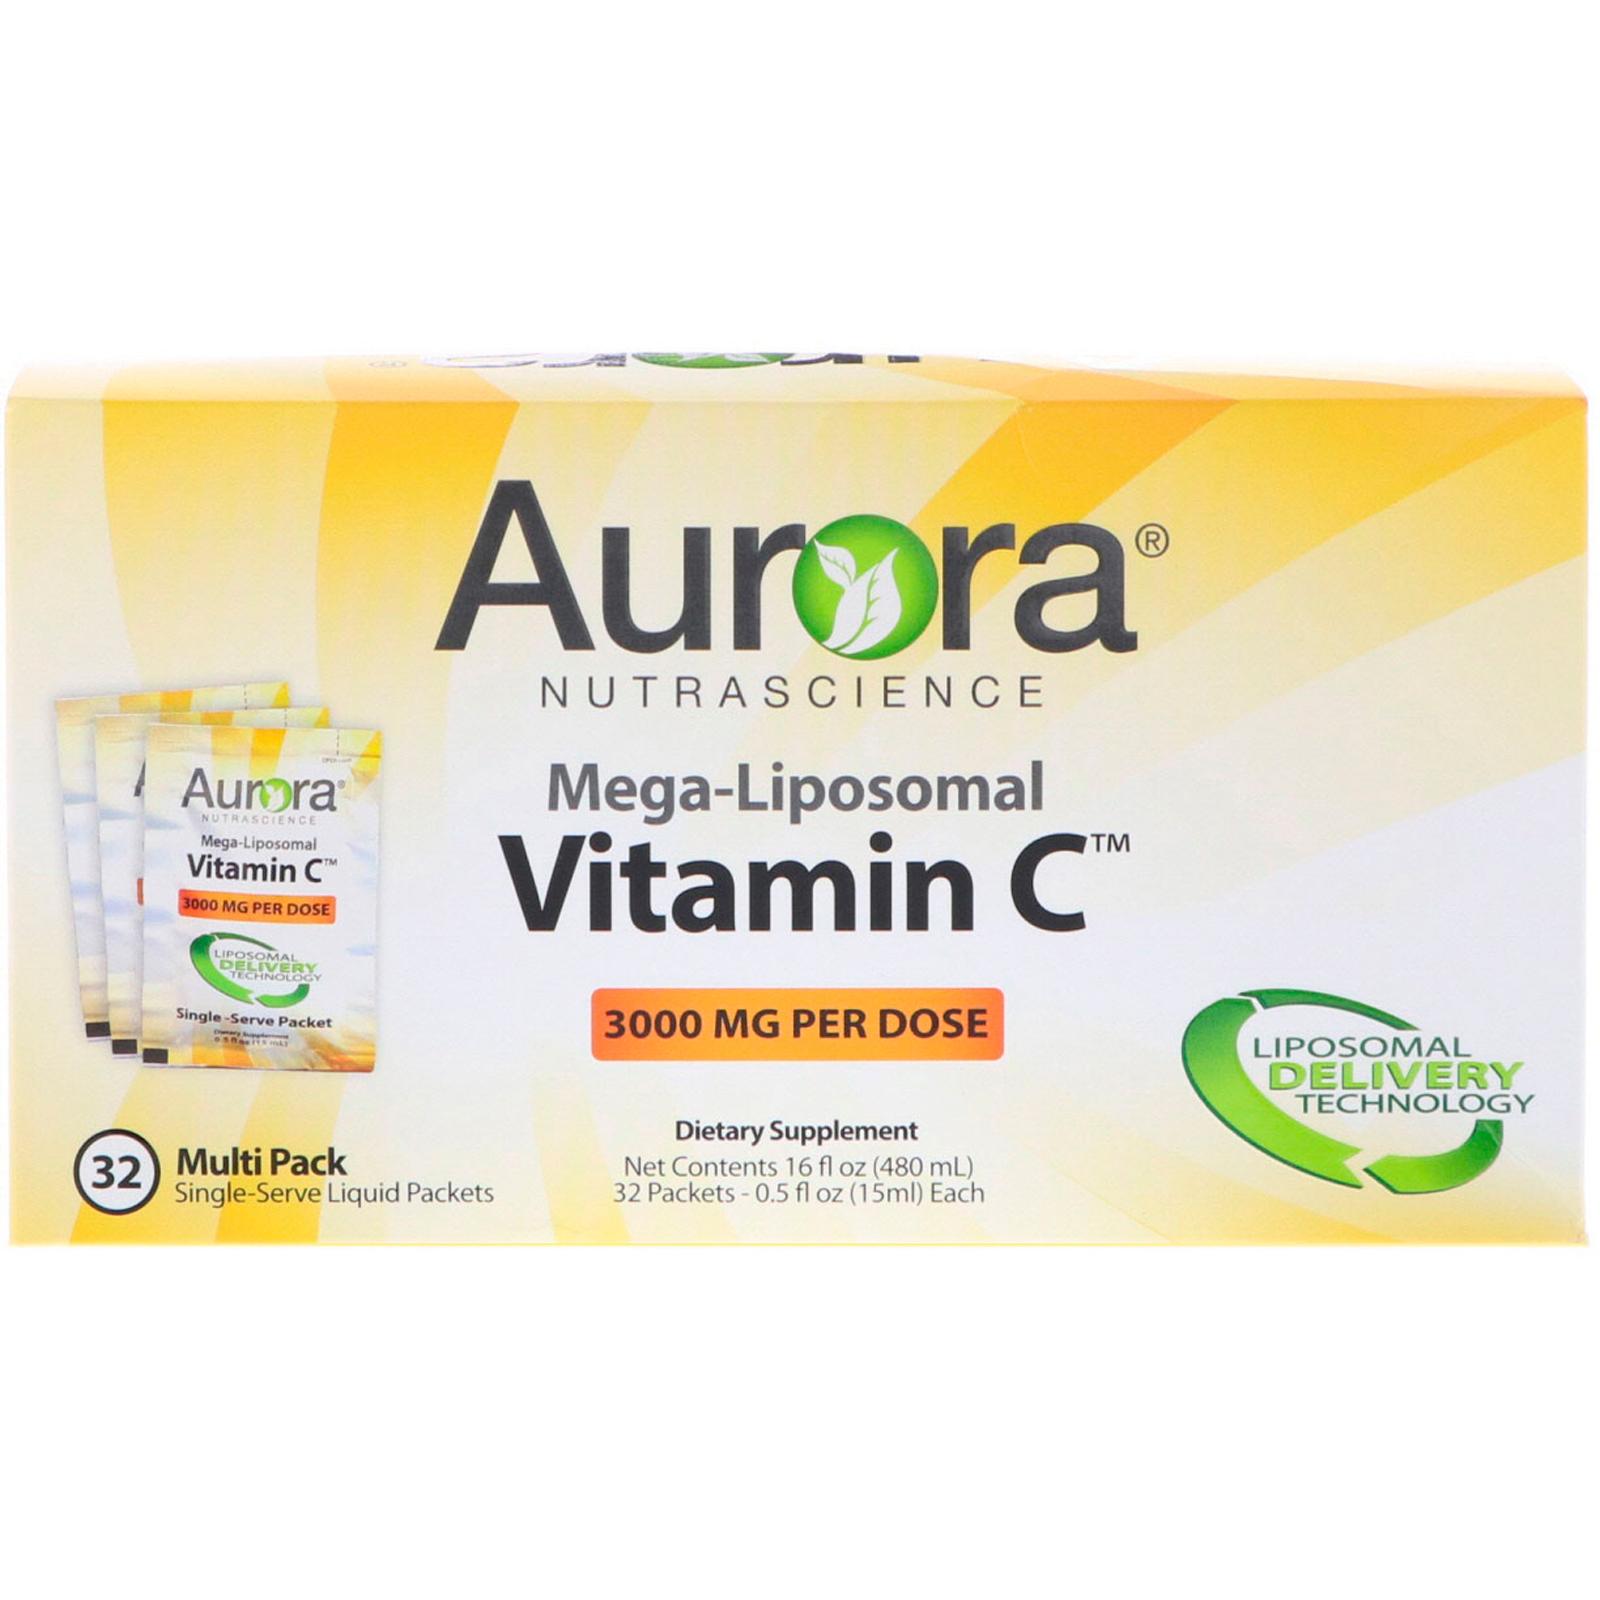 Aurora Nutrascience, Mega-Liposomal Vitamin C, 3000 mg, 32 Single-Serve  Liquid Packets, 0 5 fl oz (15 ml) Each